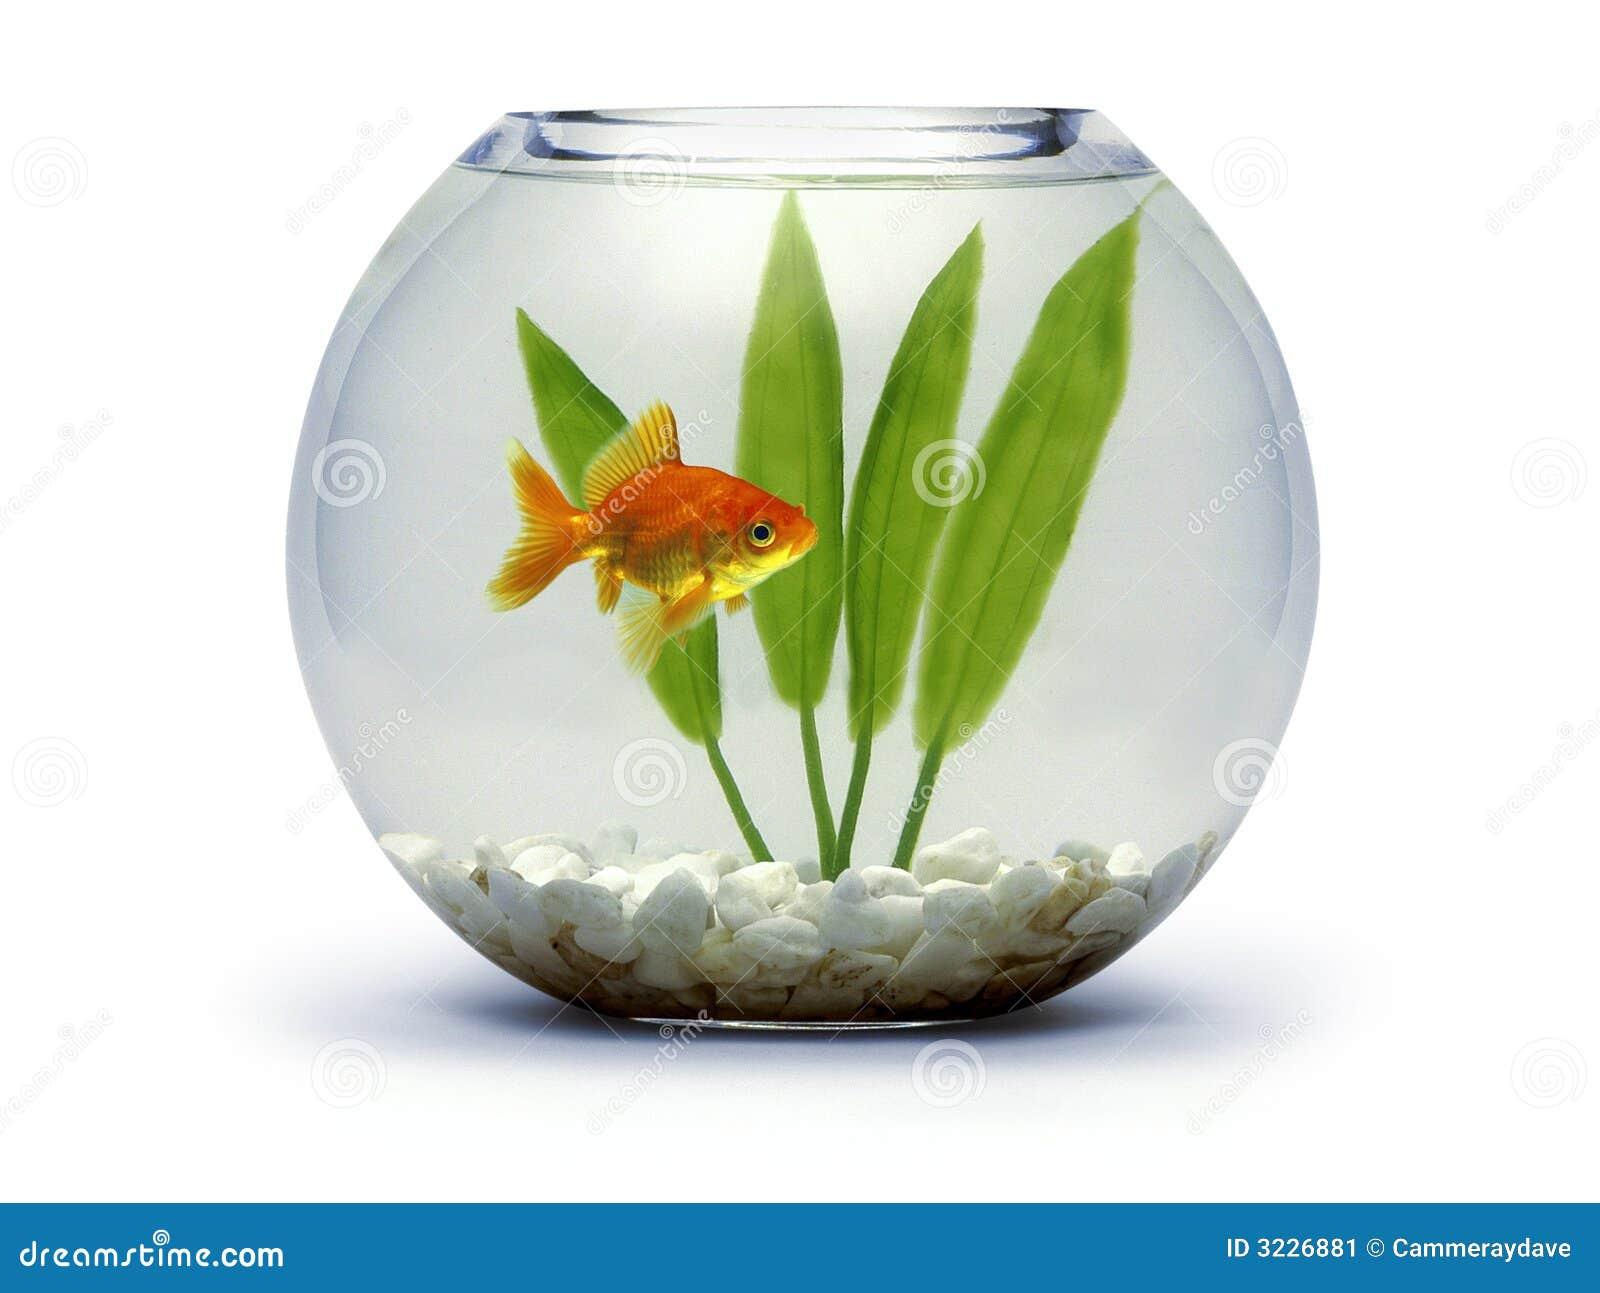 Goldfish Bowl Stock Images - Download 2,484 Photos